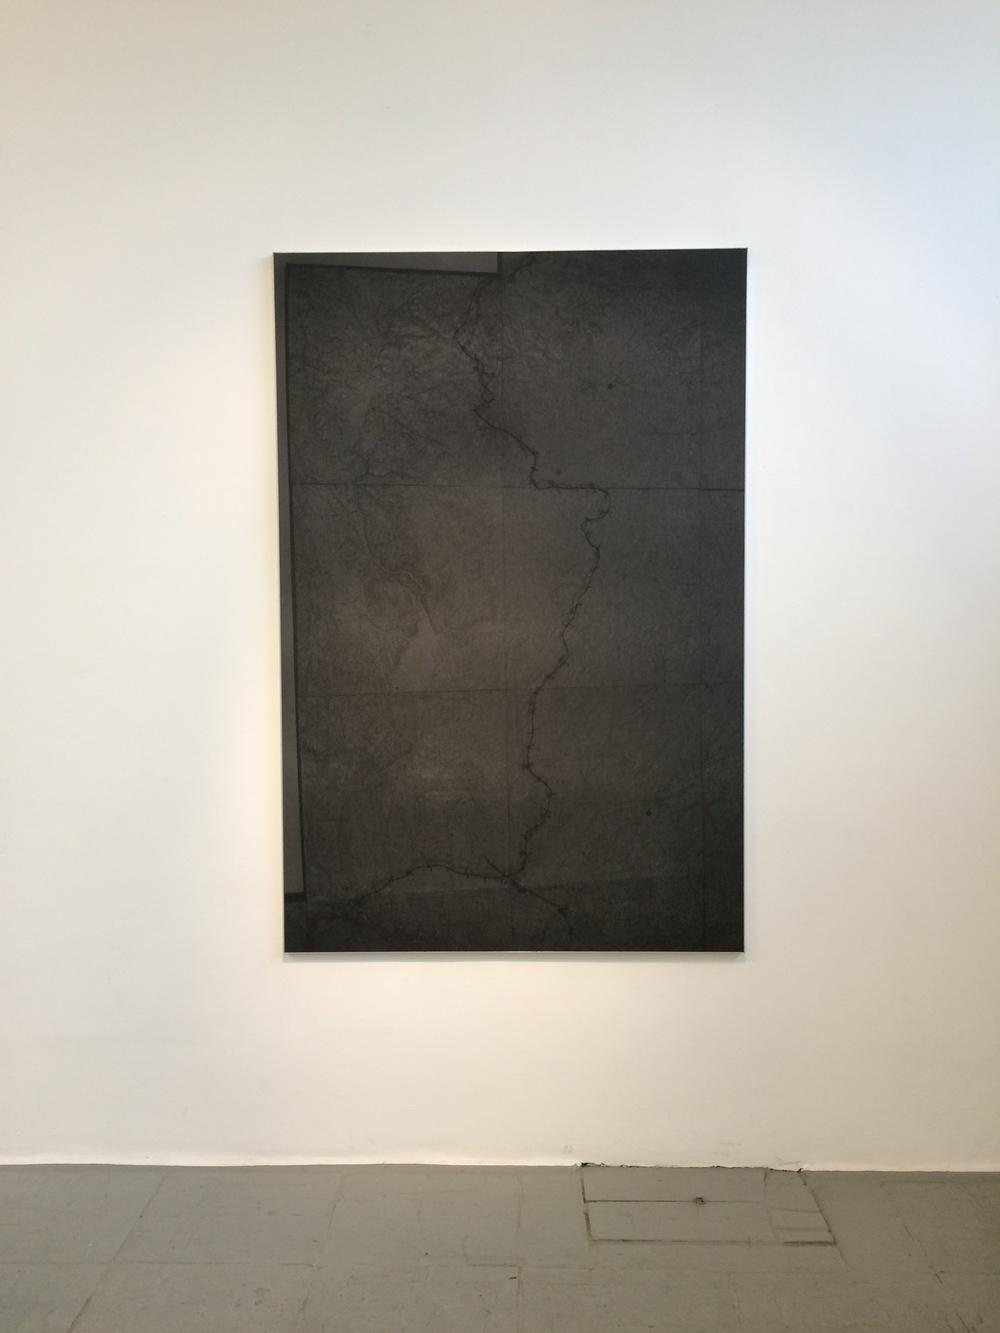 R.R.-D.R.-11 , ed. 1/3, Dirk Braeckman, 2011, zilvergelatinedruk, 180x120 cm